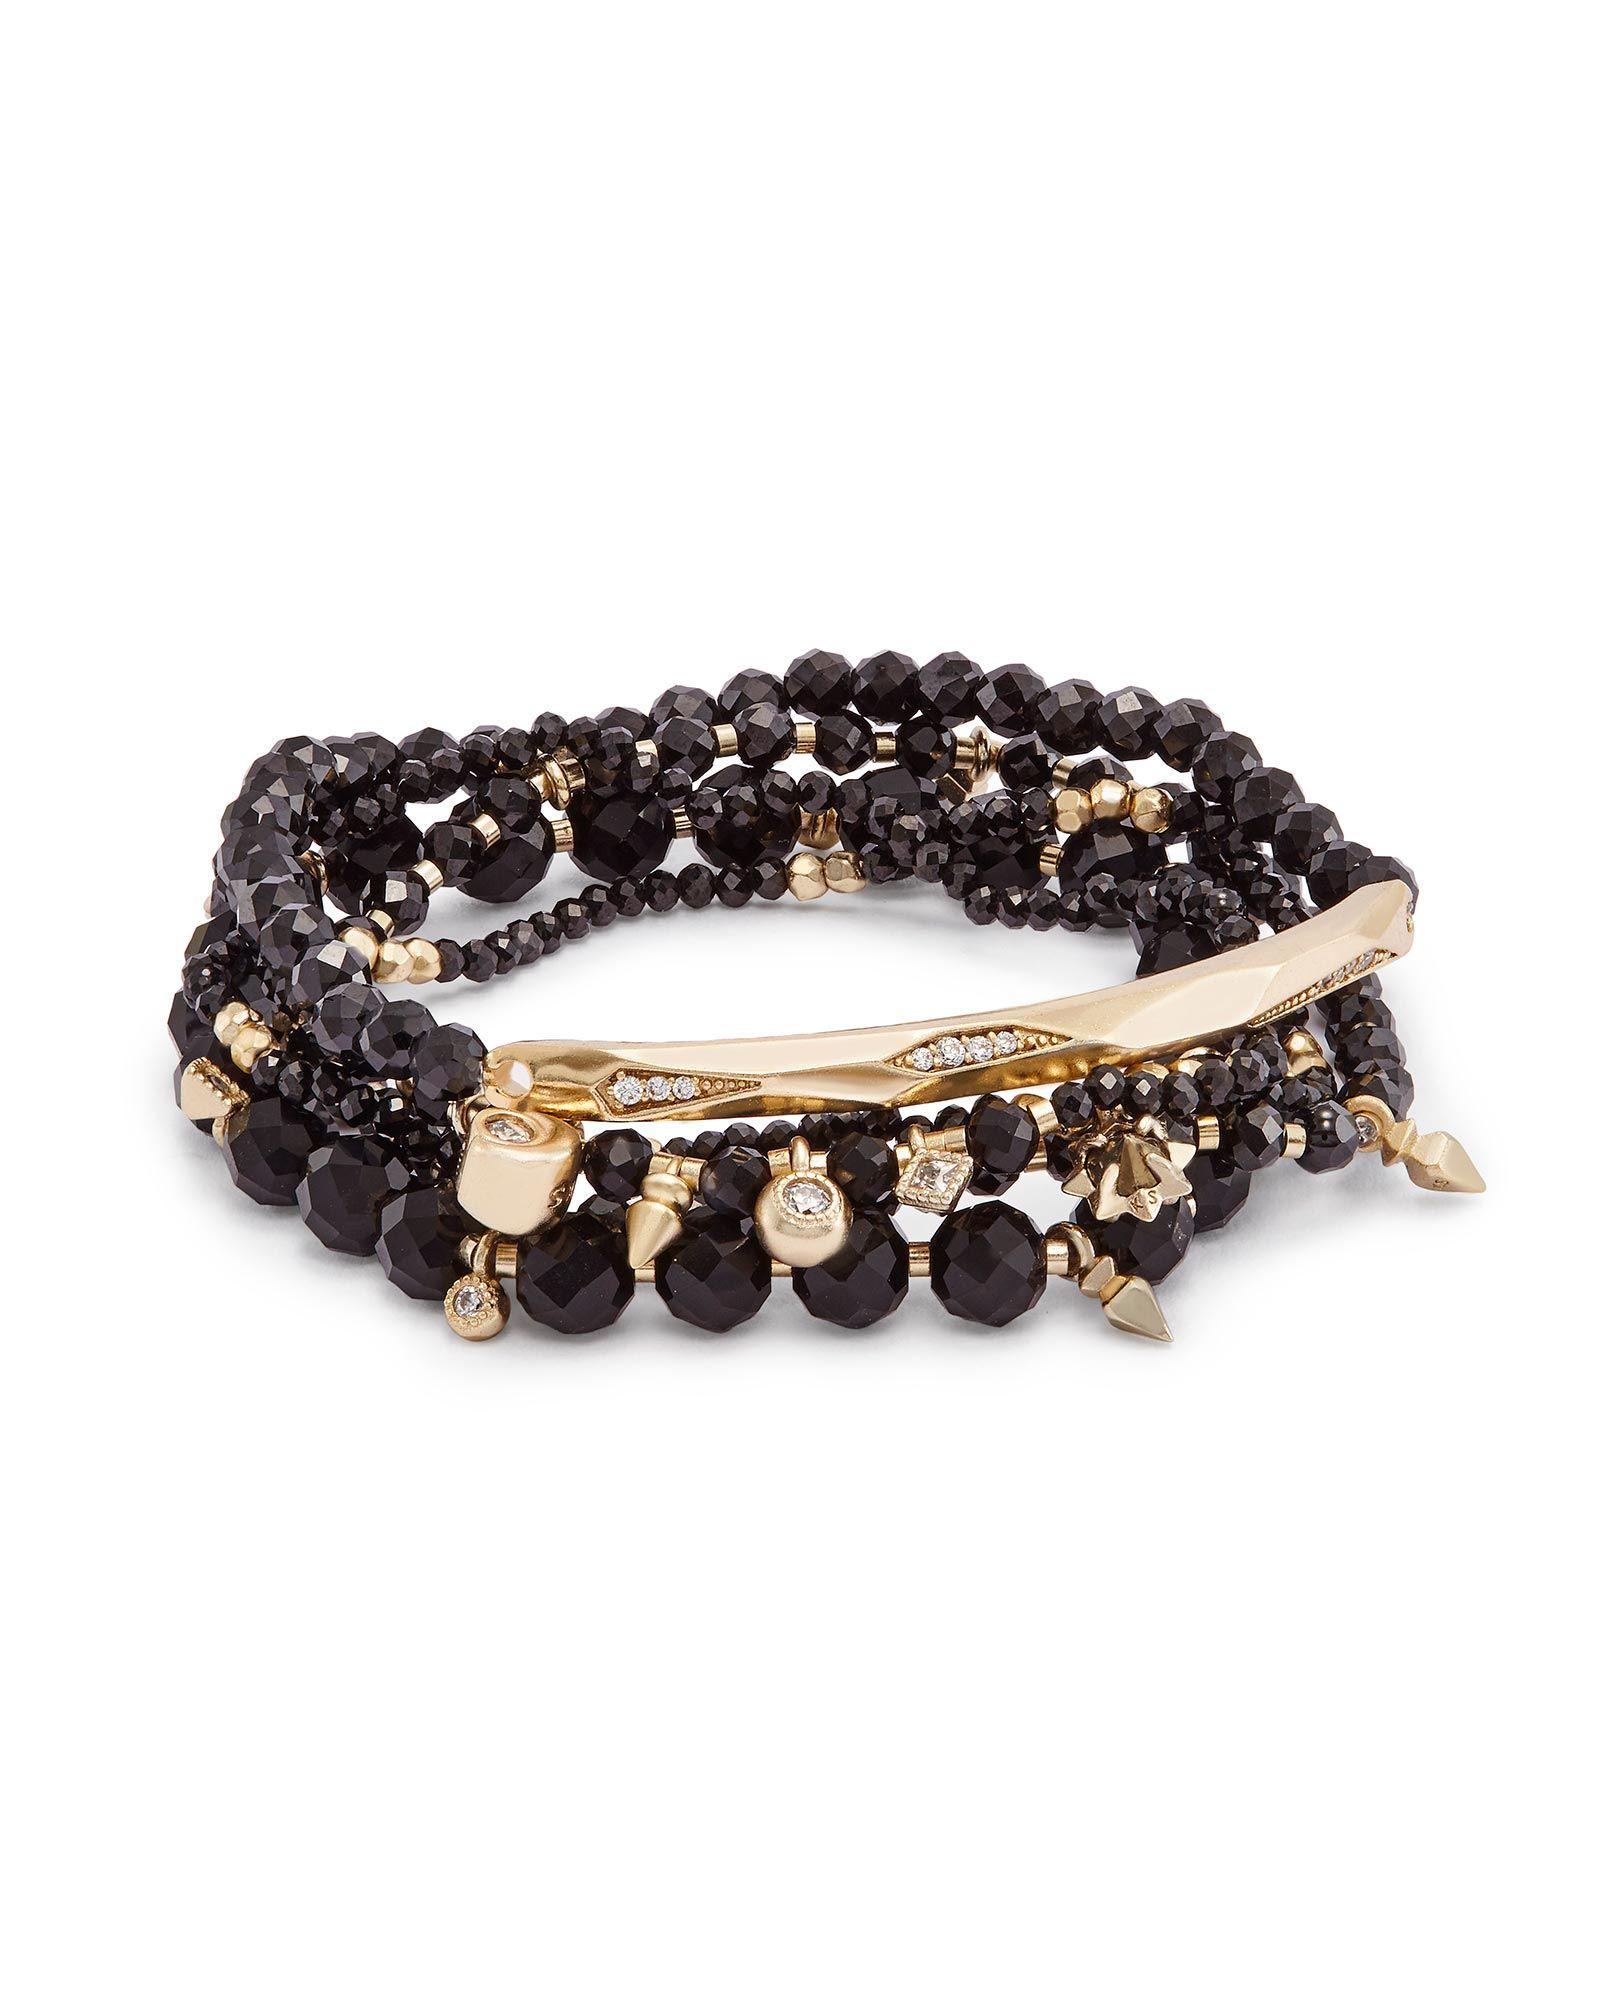 Supak bracelet kendra scott jewelry fall collection